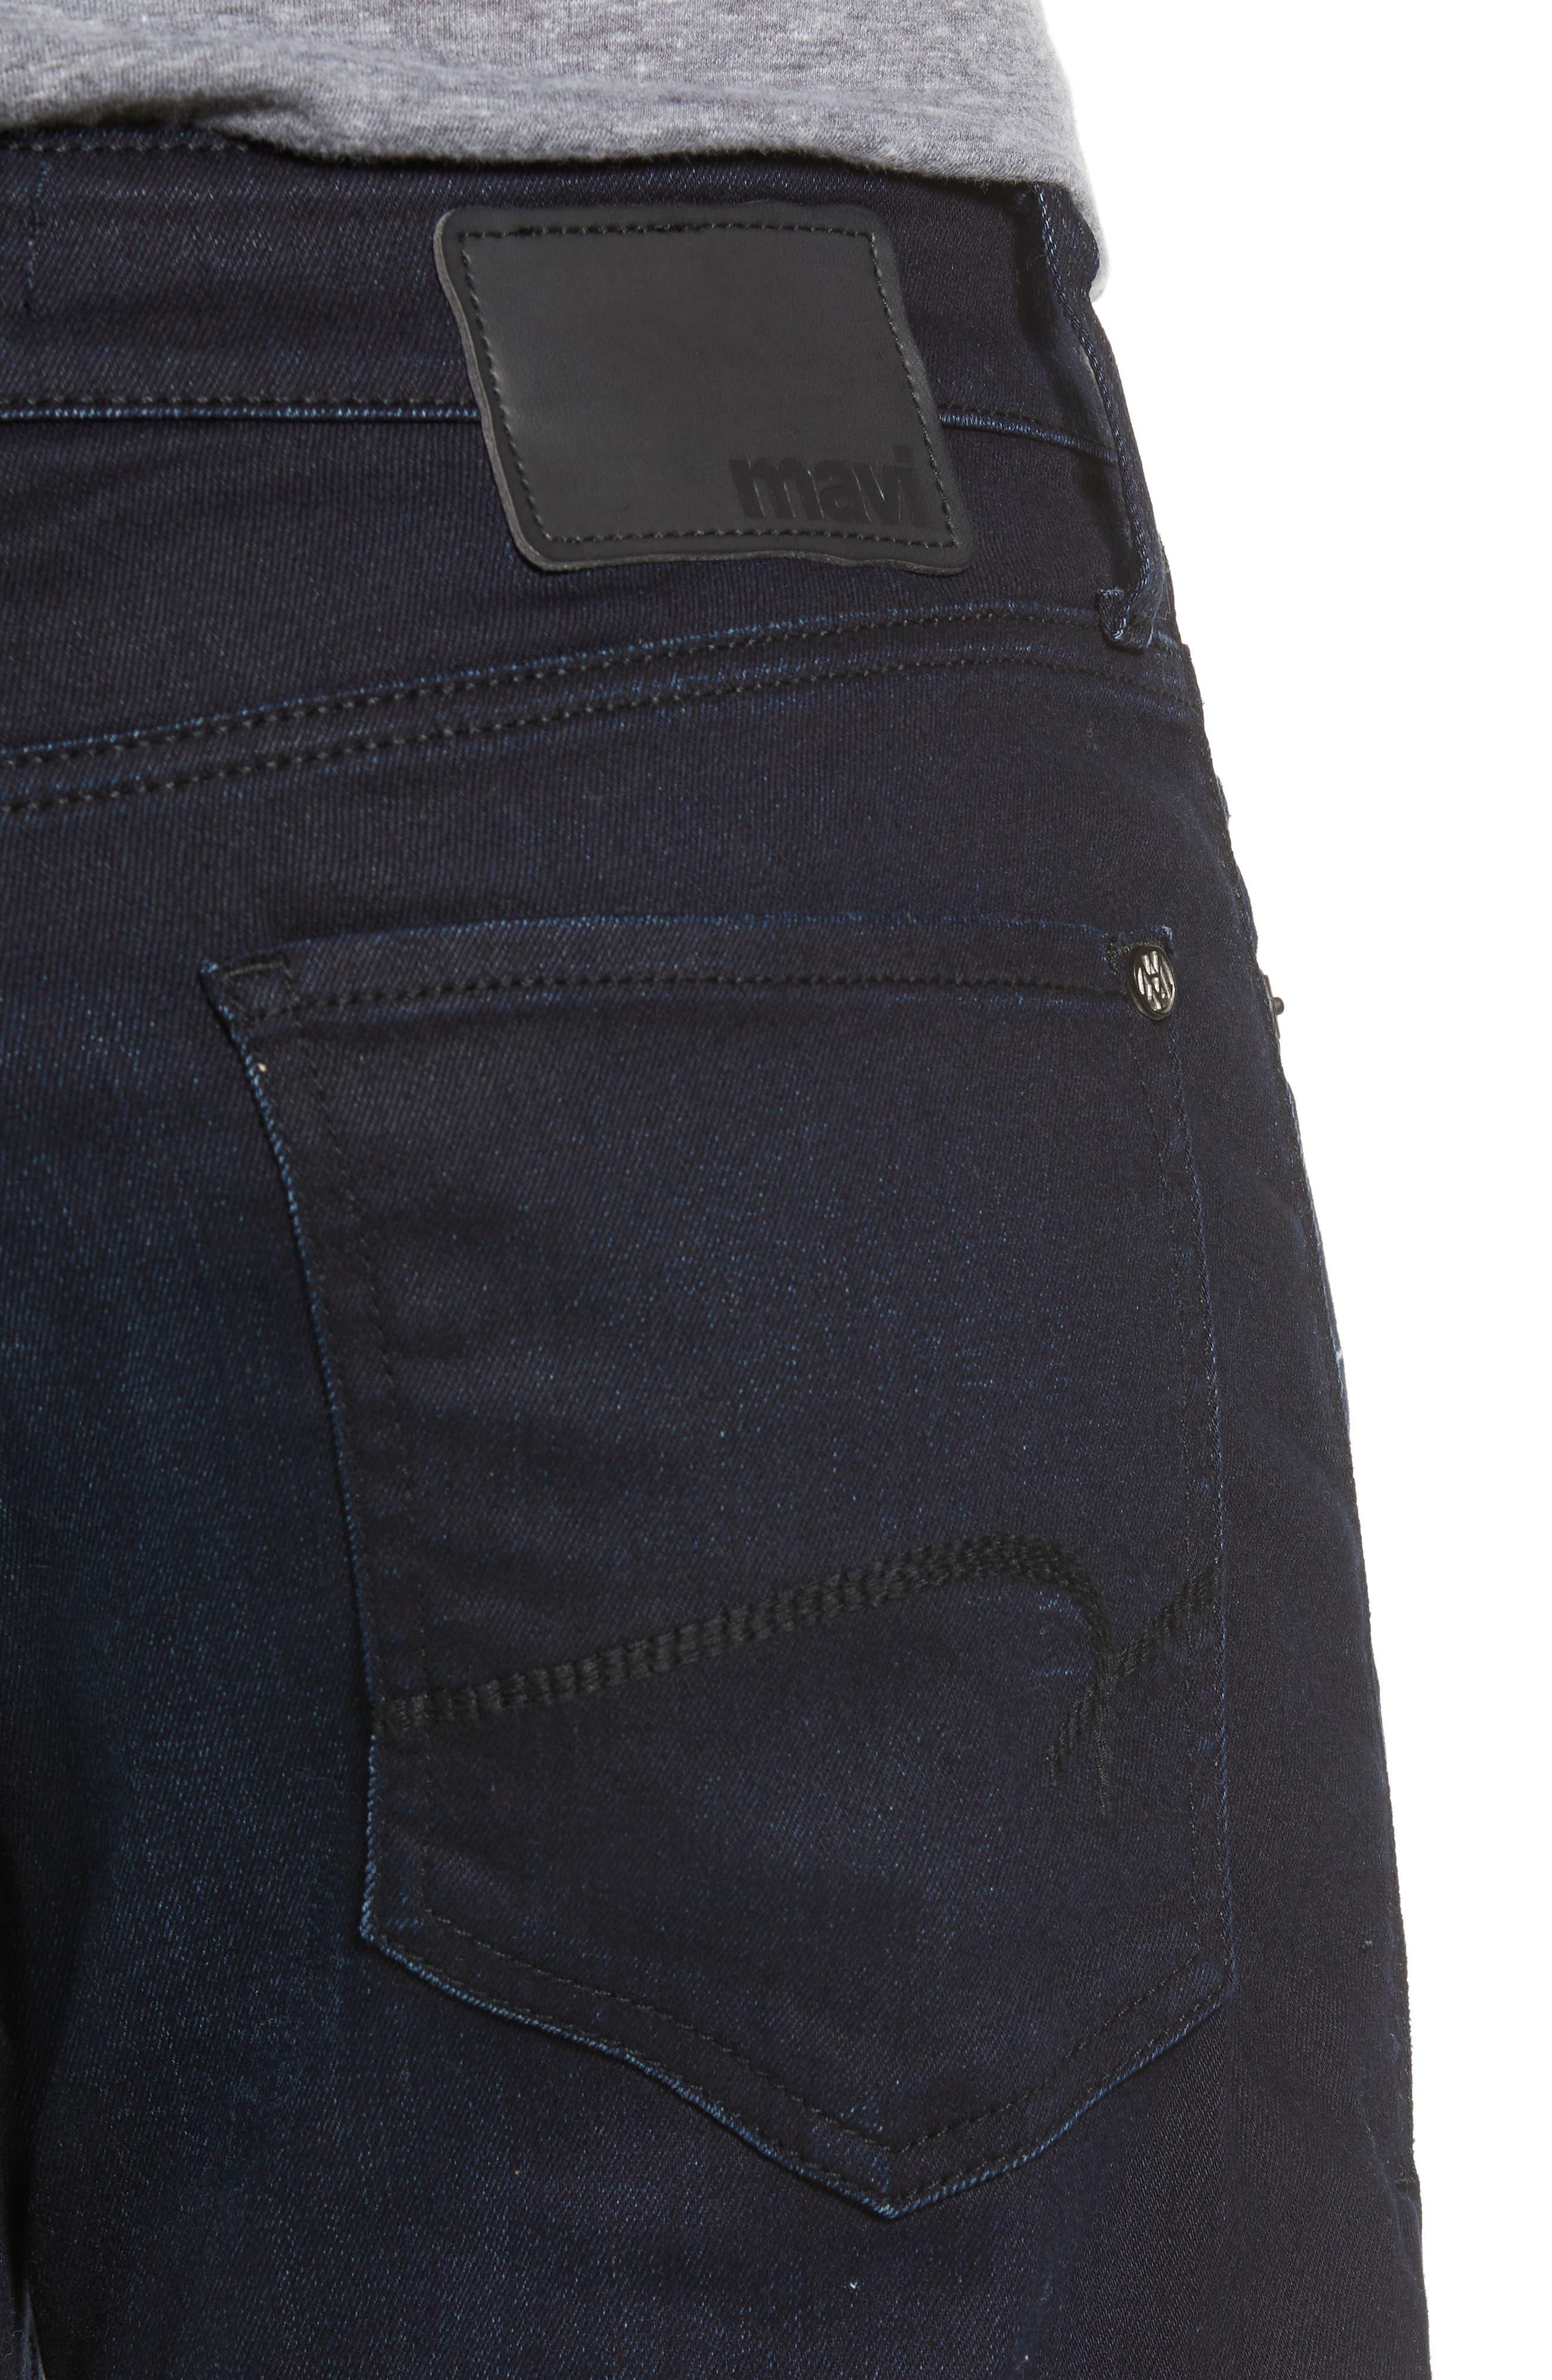 Matt Relaxed Fit Jeans,                             Alternate thumbnail 4, color,                             DEEP CAPITOL HILL